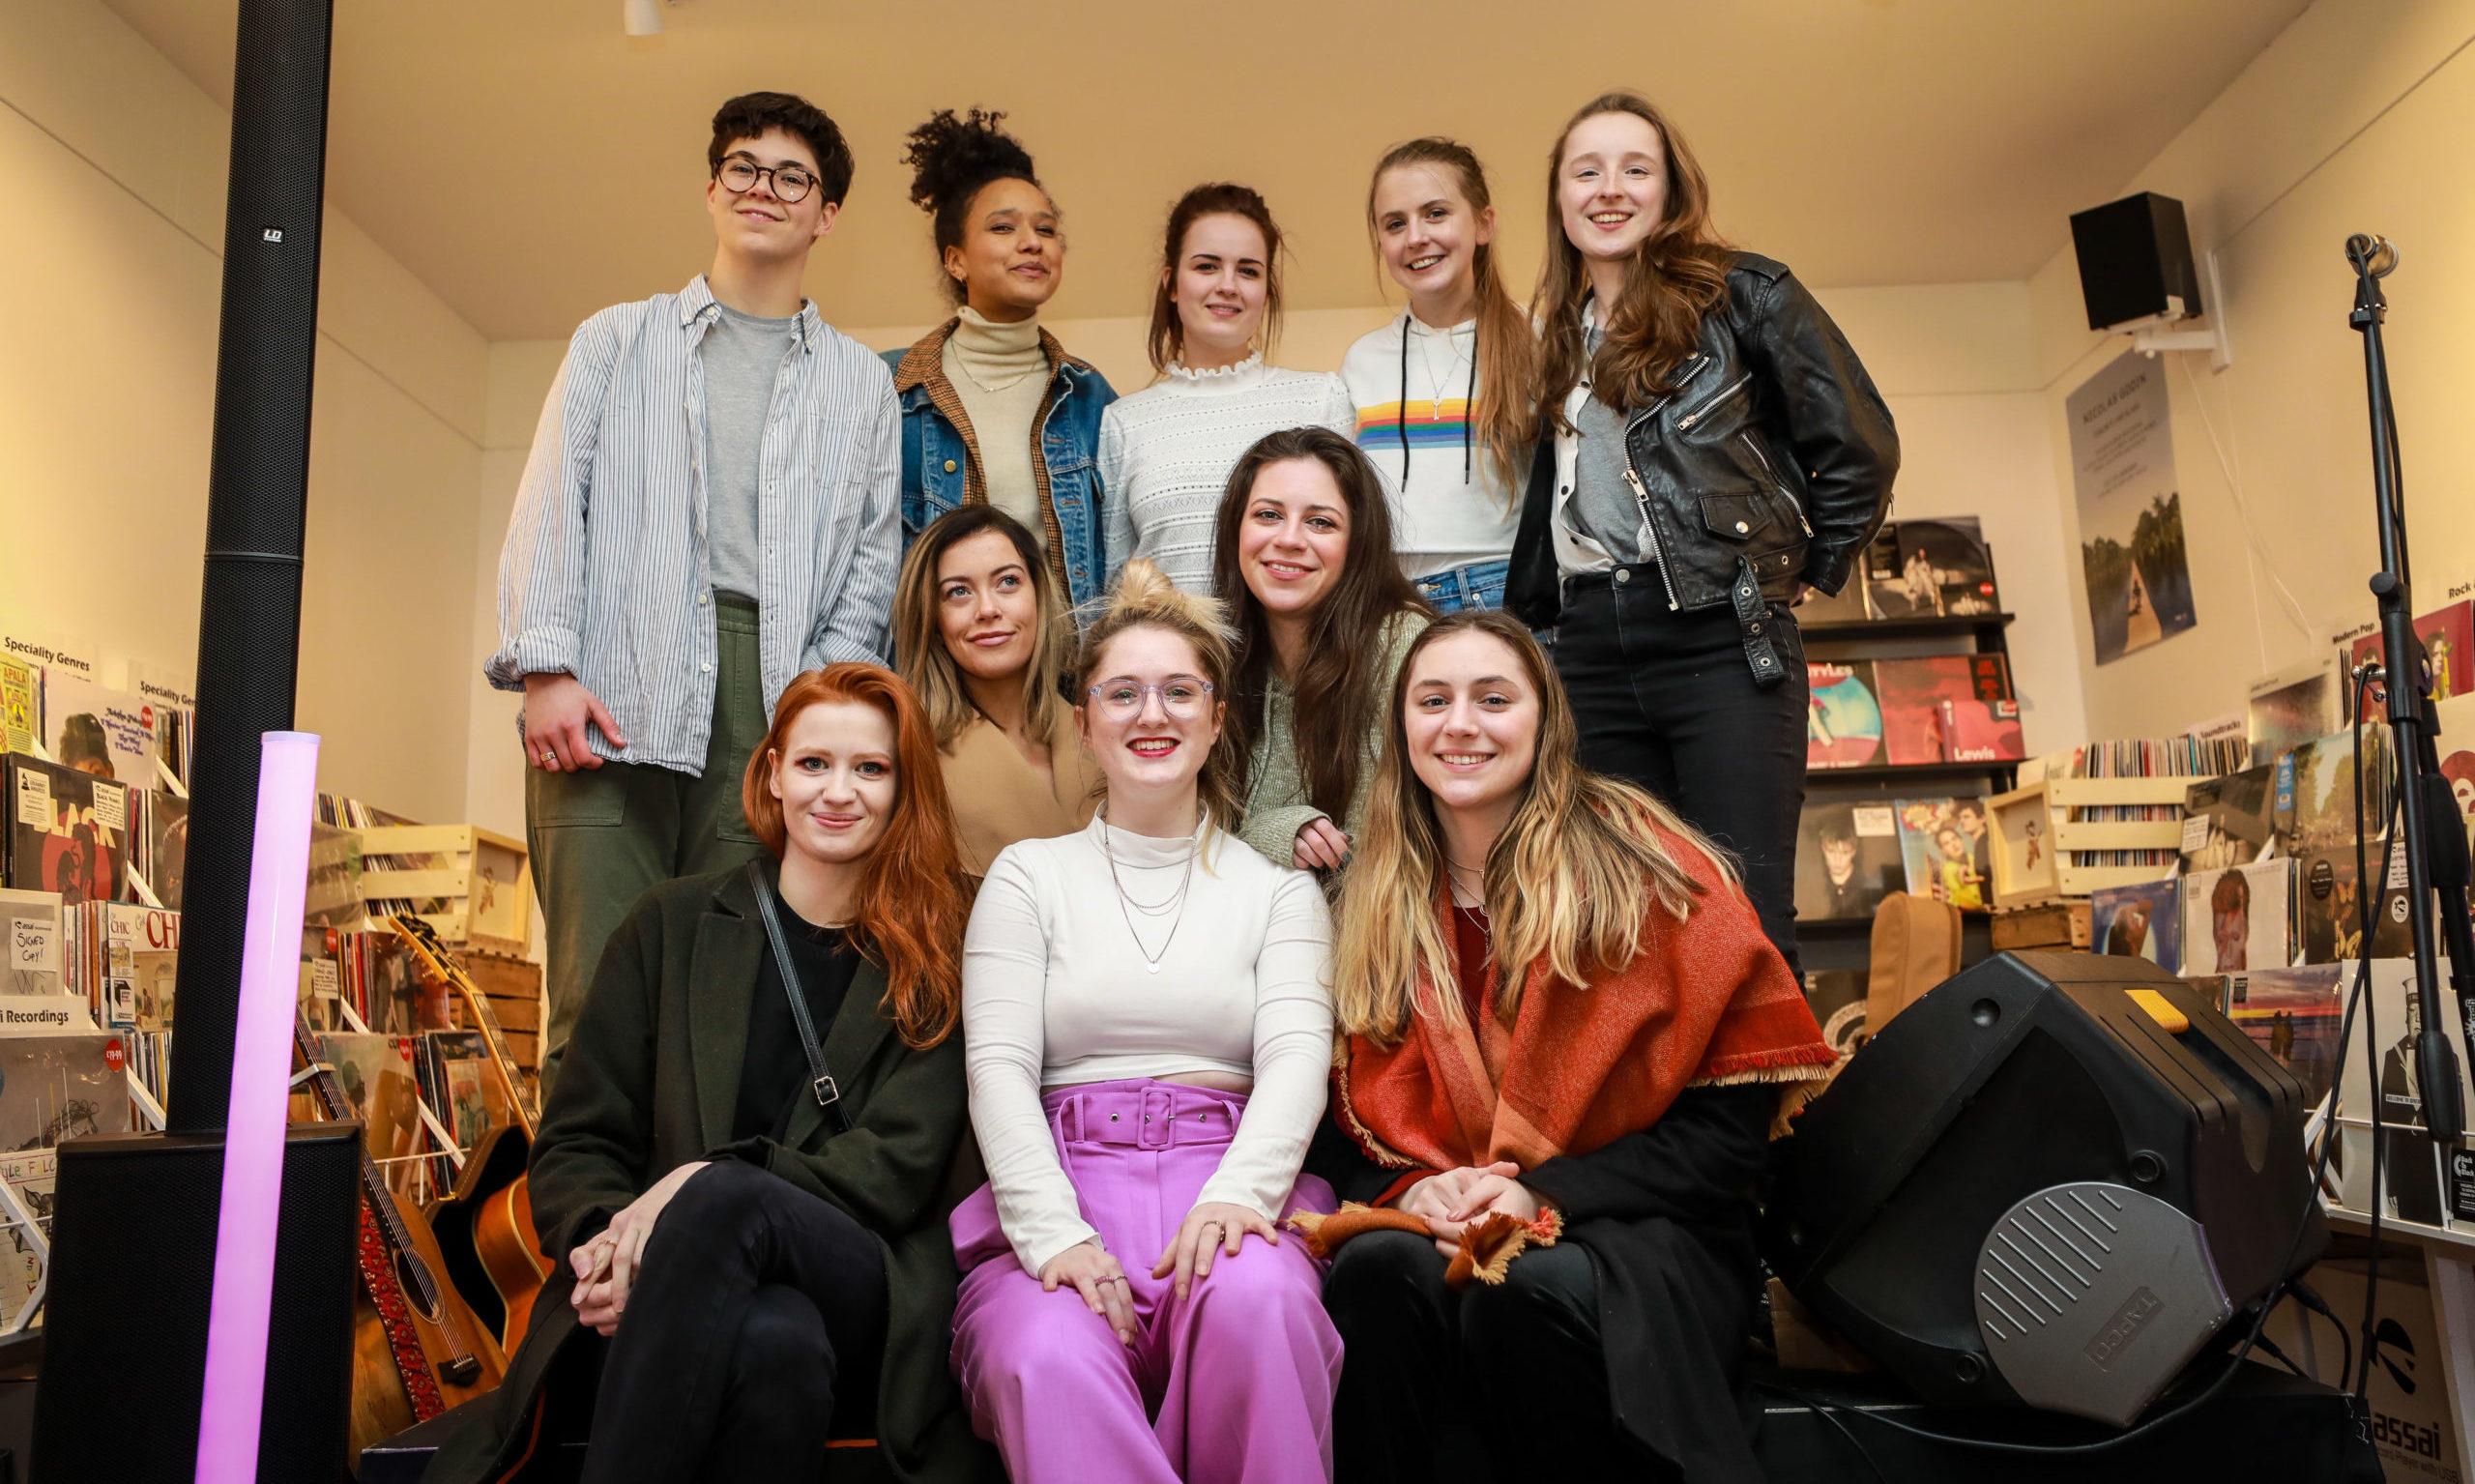 Be Charlotte (front, centre) with artists Megan Davidson, Becky Sikasa, Emily Atkinson, Rebecca Shearing, Zoe Graham, Stephanie Cheape, Anna Sweeney, Rachel Johnson and Liv Dawn.